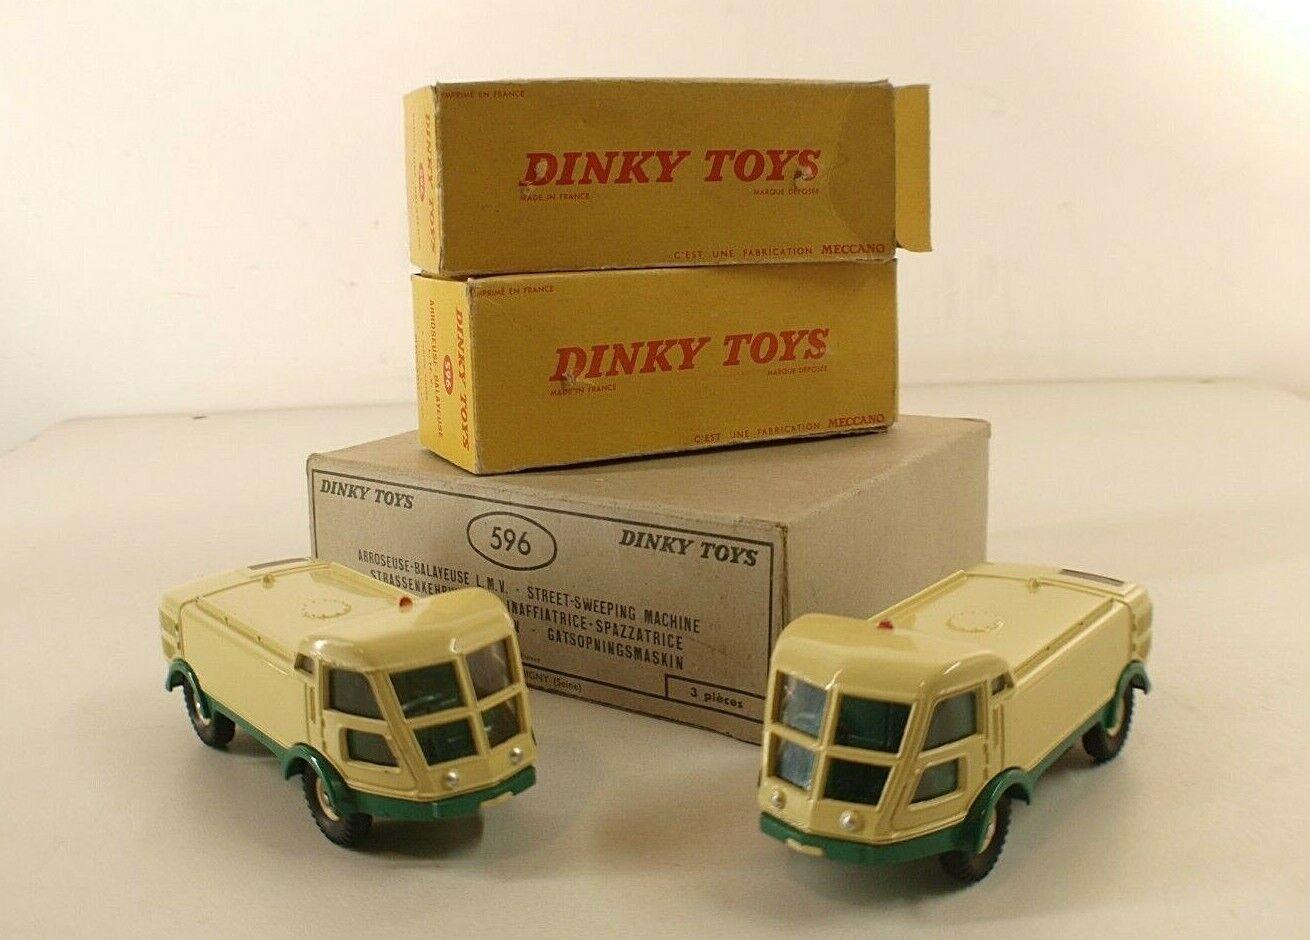 Dinky Toys F n° 596 boite revendeur avec 2 arroseuse balayeuse LMV neuves RARE